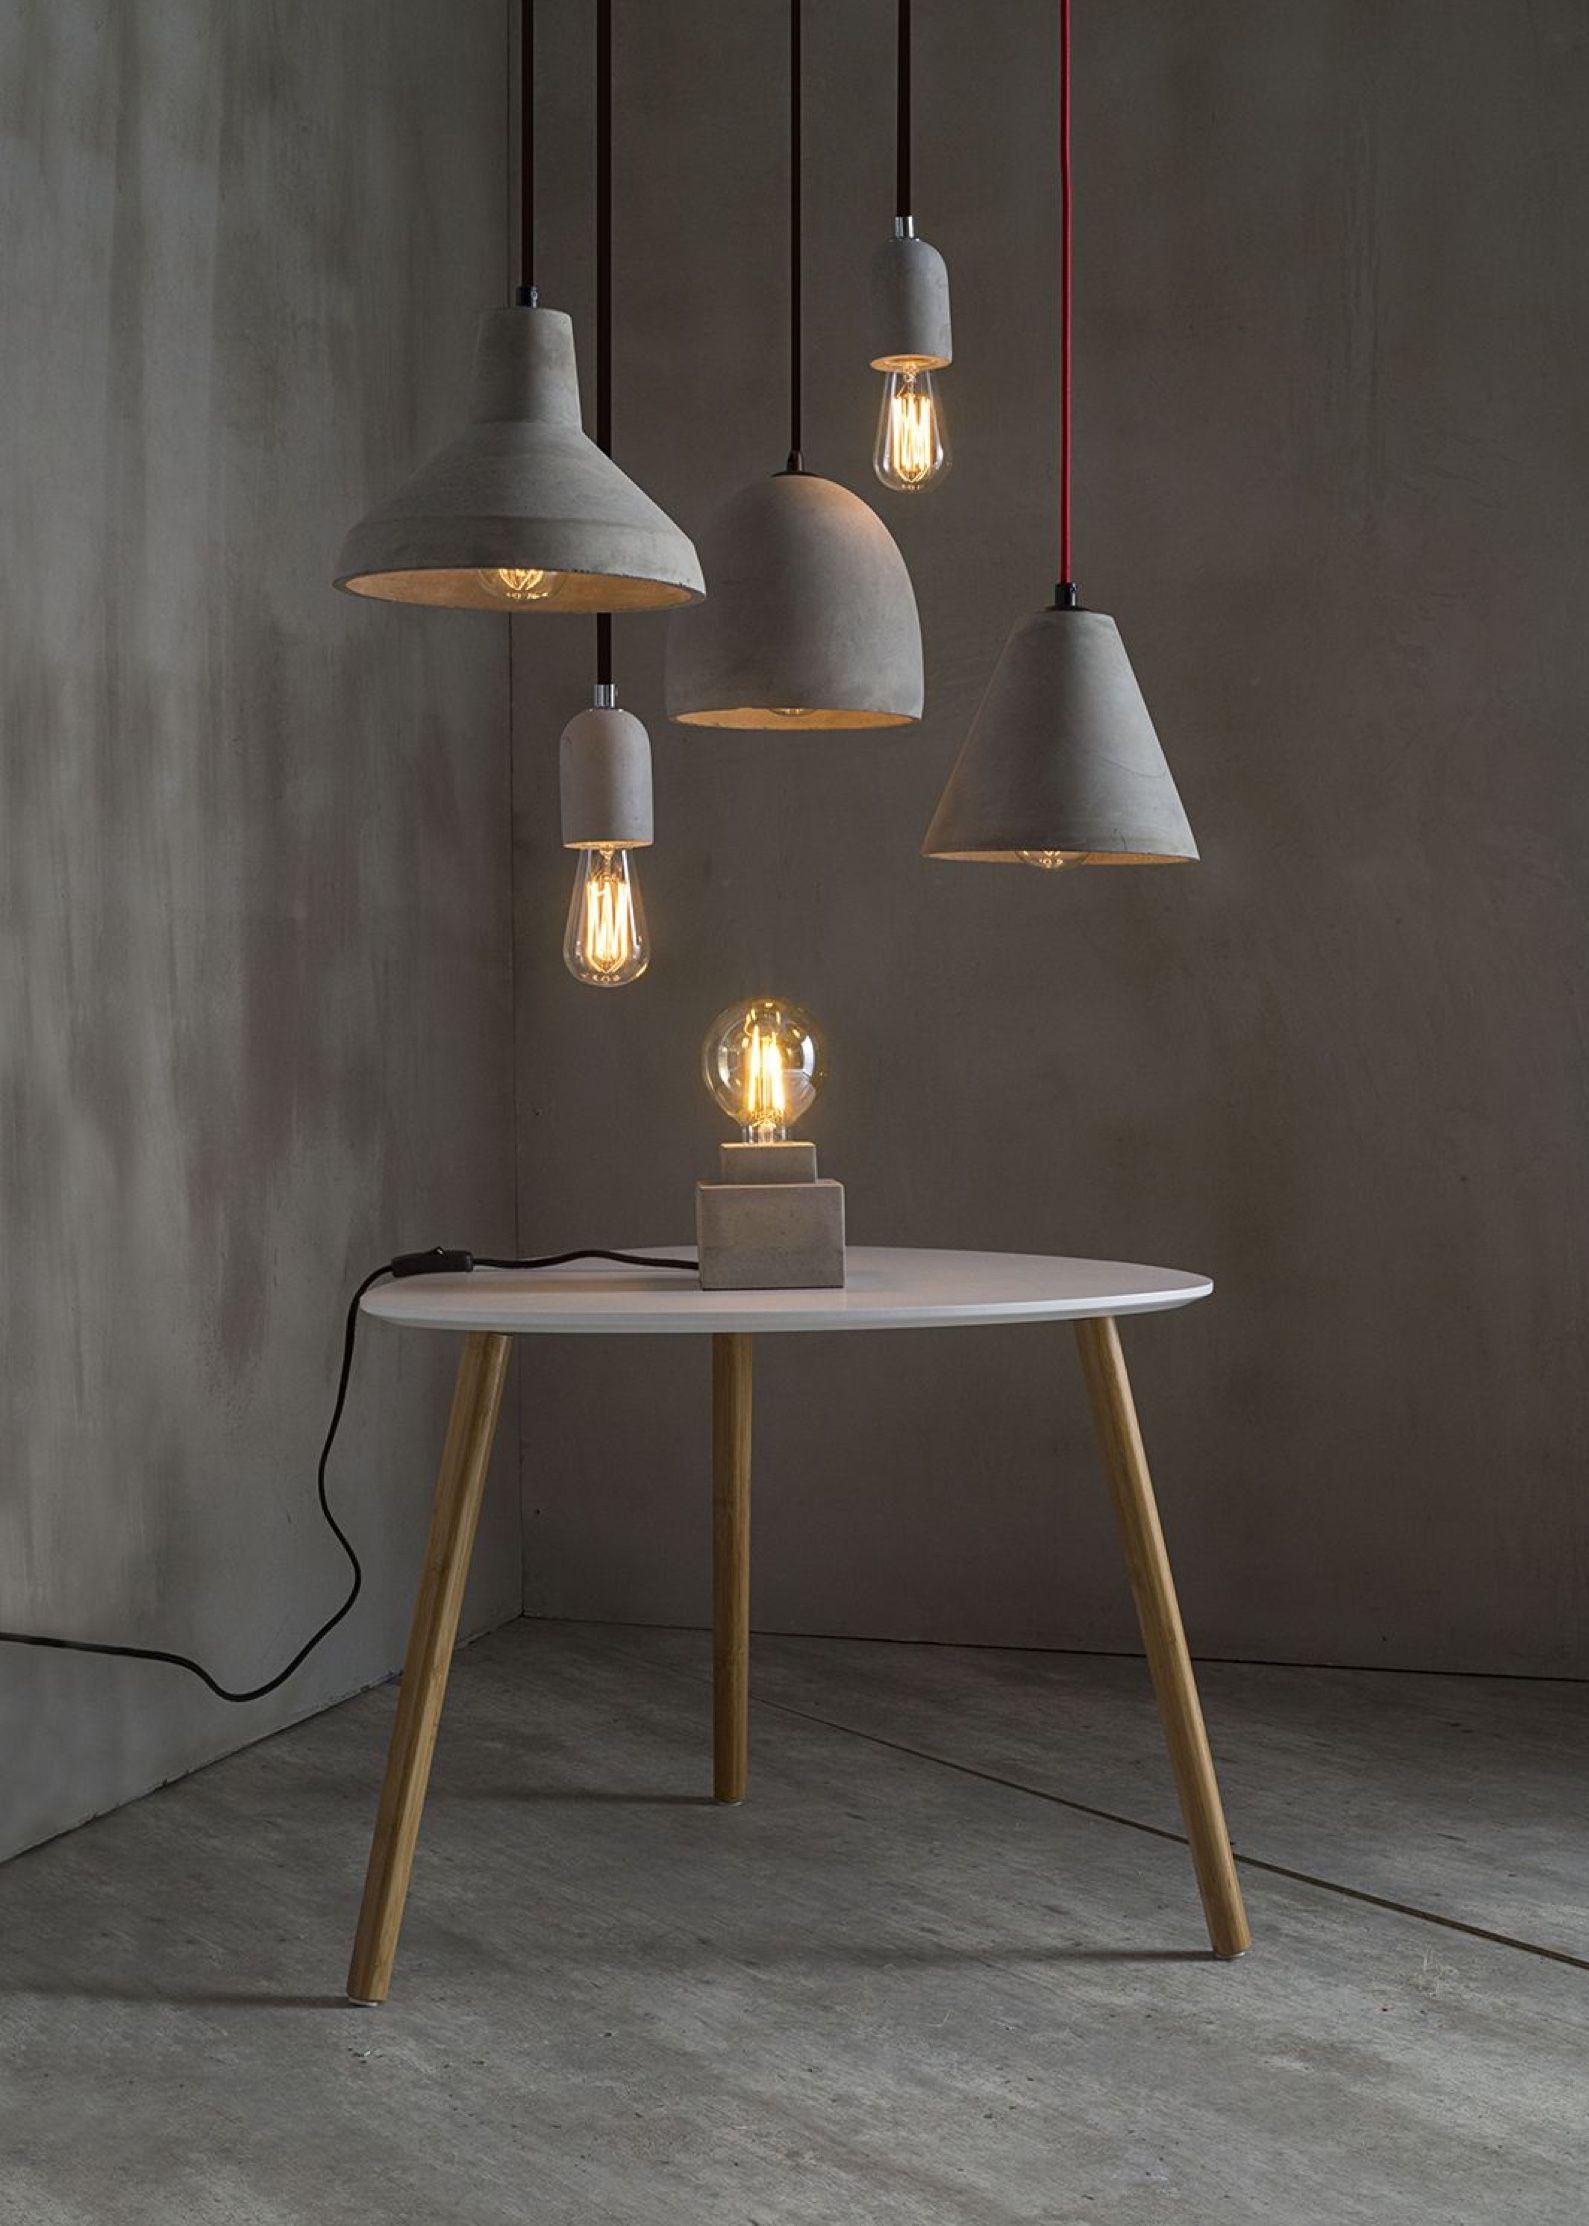 En Design Que LuminairesSuspensions Debo BétonProyectos 0P8nOkw